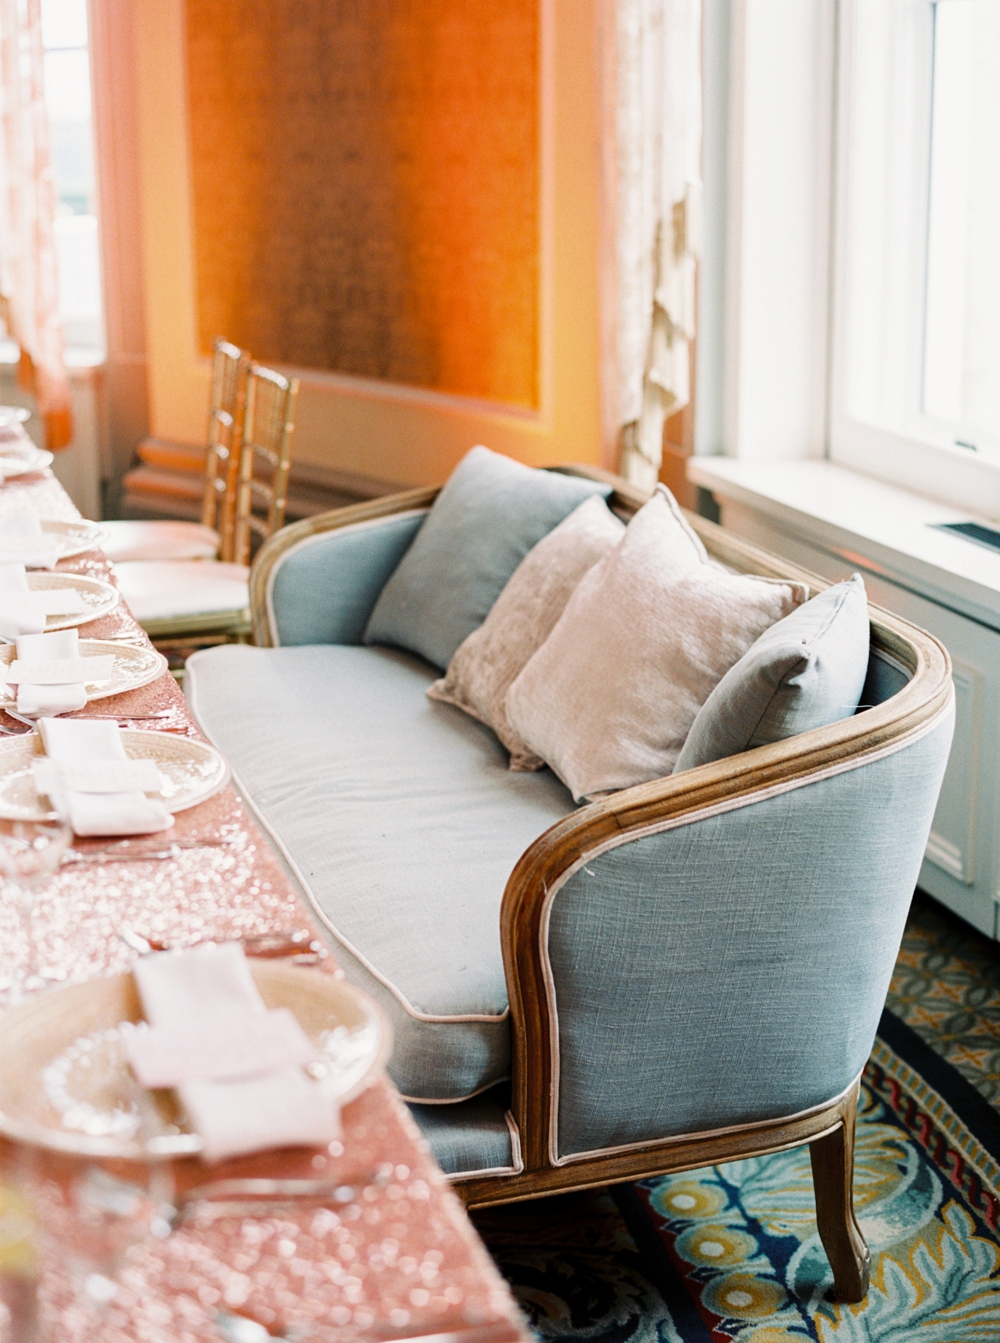 Calgary Wedding Photographer | Fairmont Hotel Macdonald Wedding | J'adore Weddings & Events Design | Edmonton Photography | Fine Art Film Wedding Photographer | Wedgewood room elegant reception decor